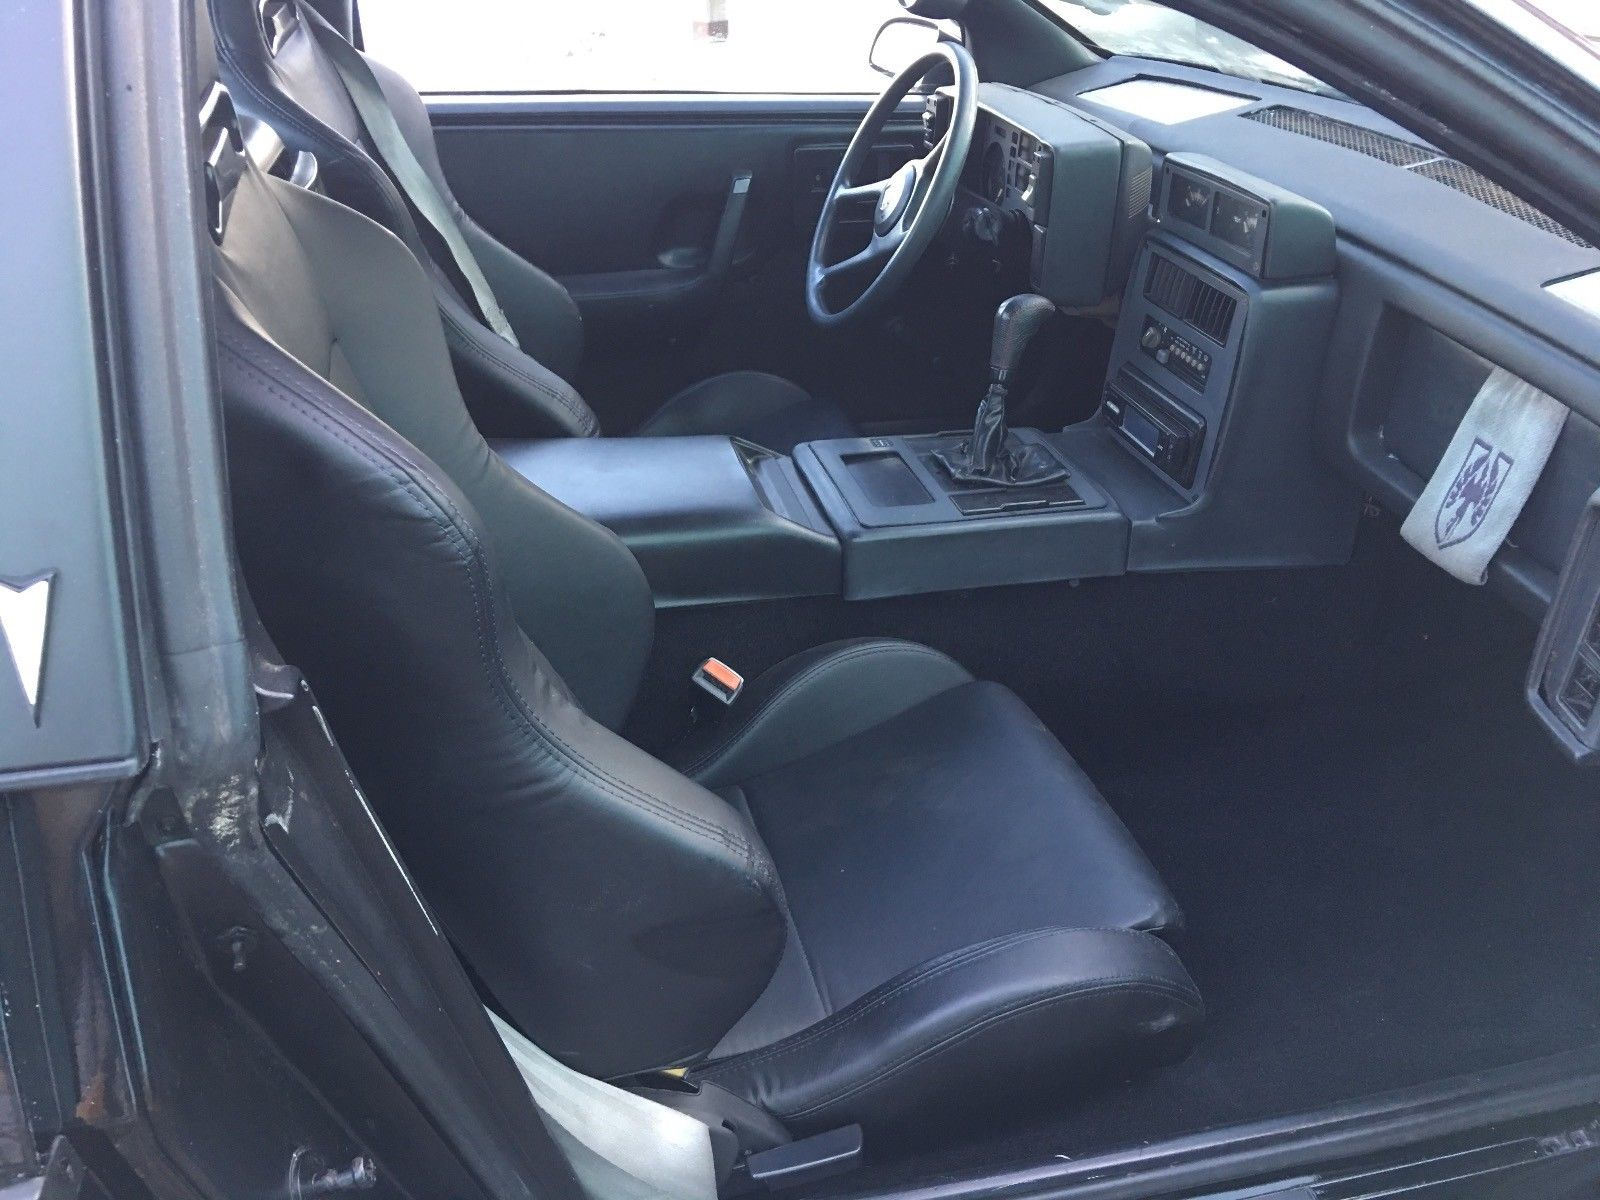 1986 Pontiac Fiero seats